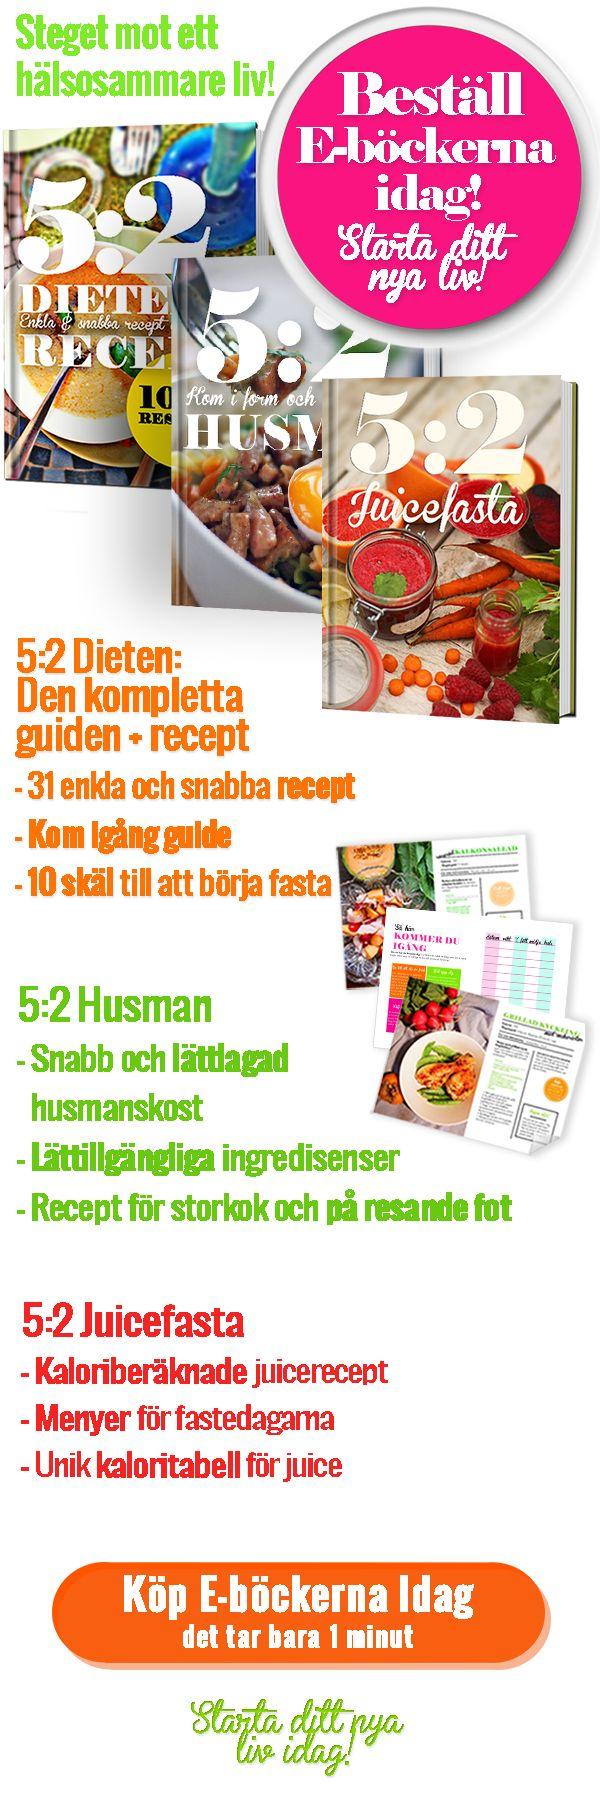 5-2 recept, 52 dieten recept, 5-2dieten recept, 5-2 diet